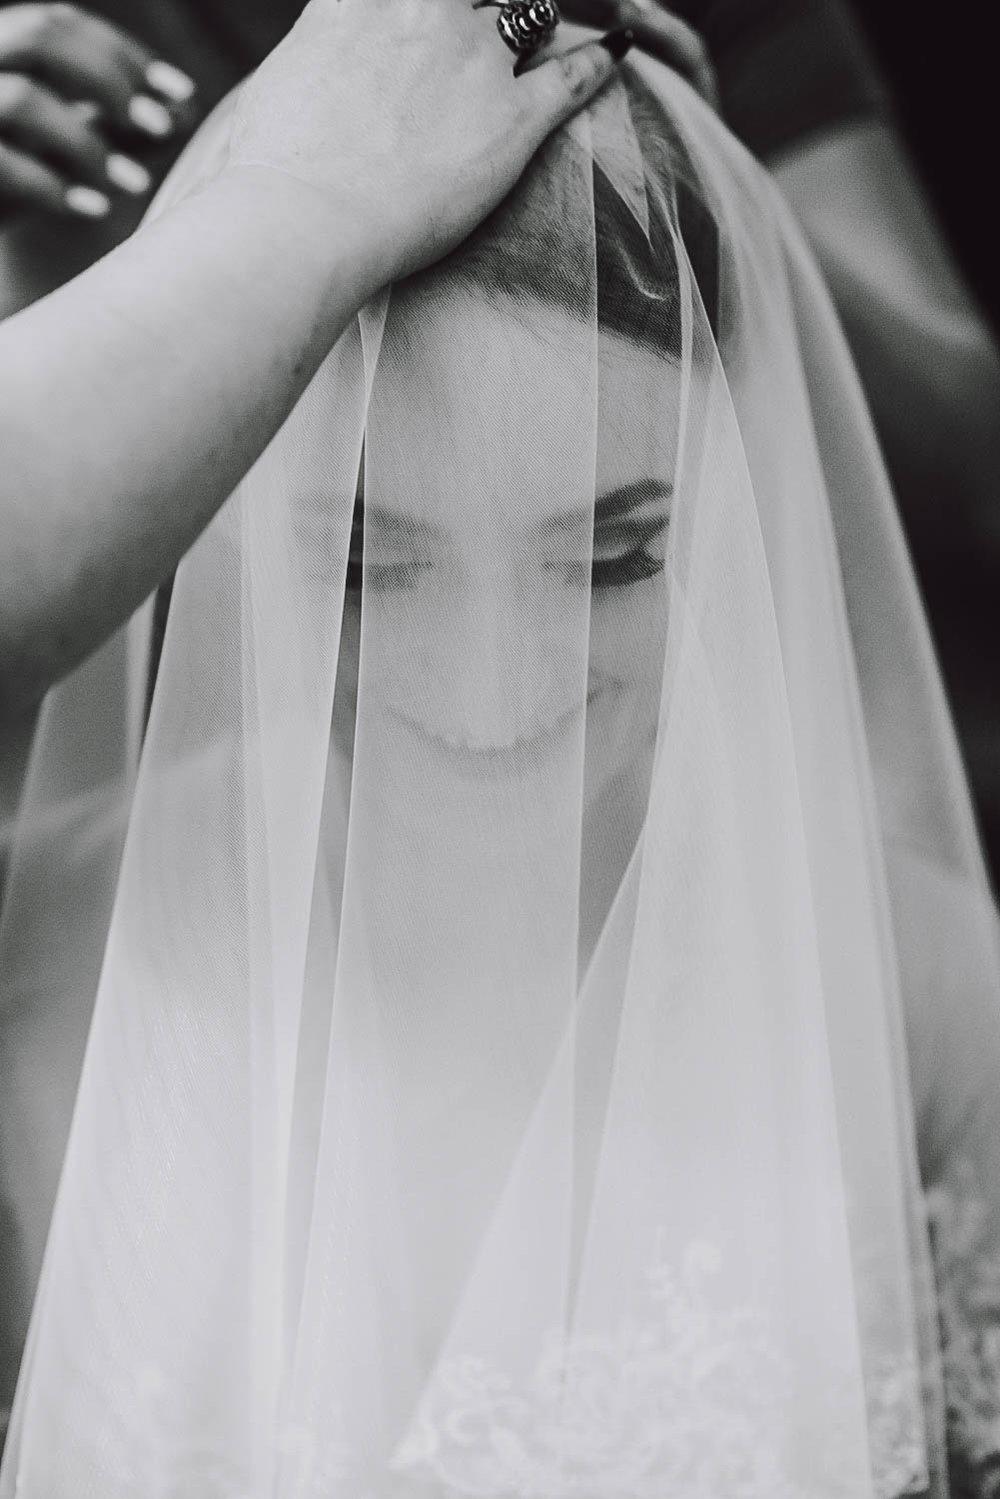 ecaterina-chandu-dondeti-wedding-photography10.jpg